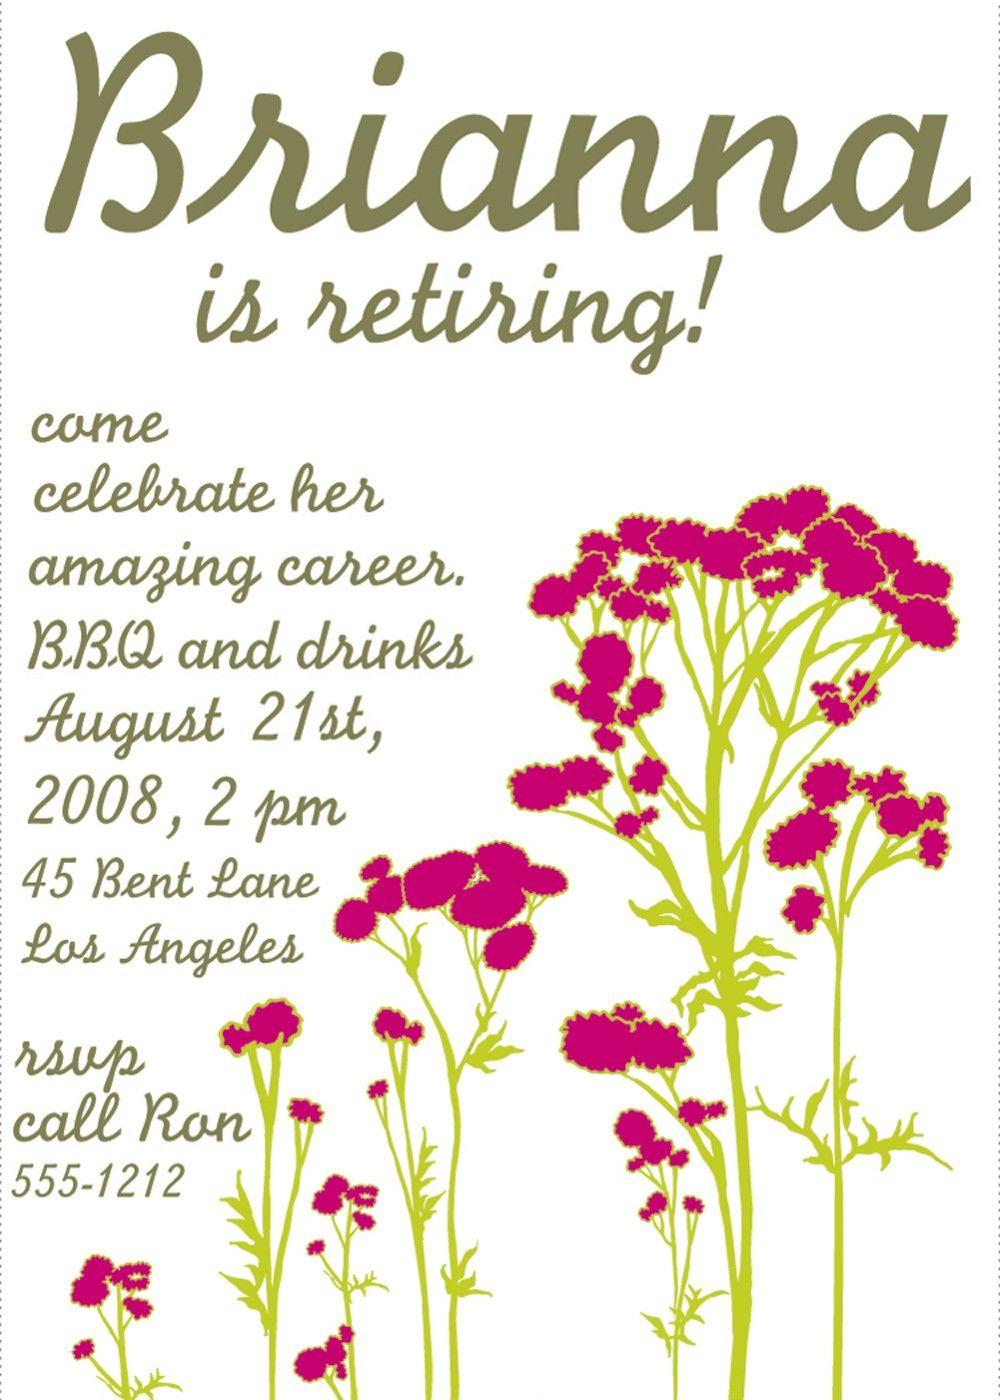 Free Printable Retirement Party Invitations Templates | Betsy's - Free Printable Retirement Party Invitations